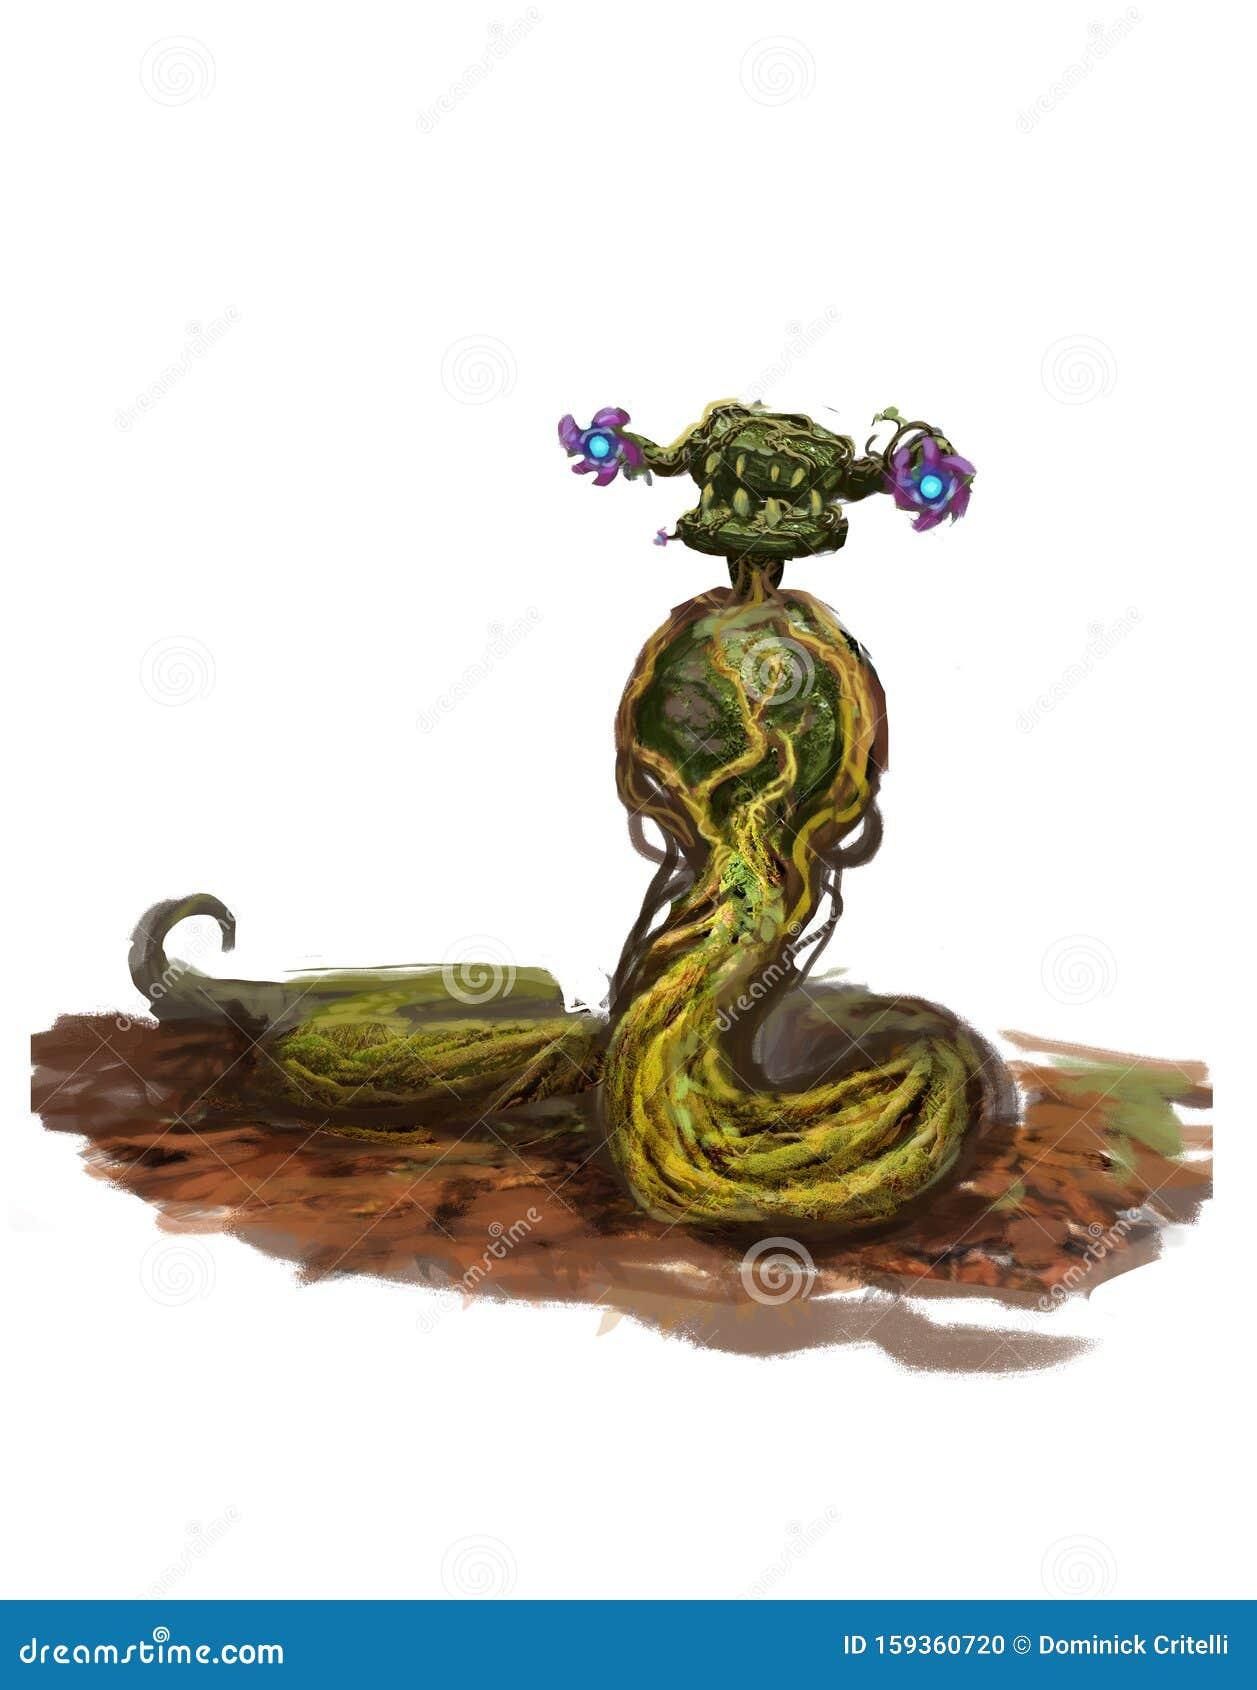 Illustration Of Magic Moss Snake Creature Stock Illustration Illustration Of Isolated Concept 159360720